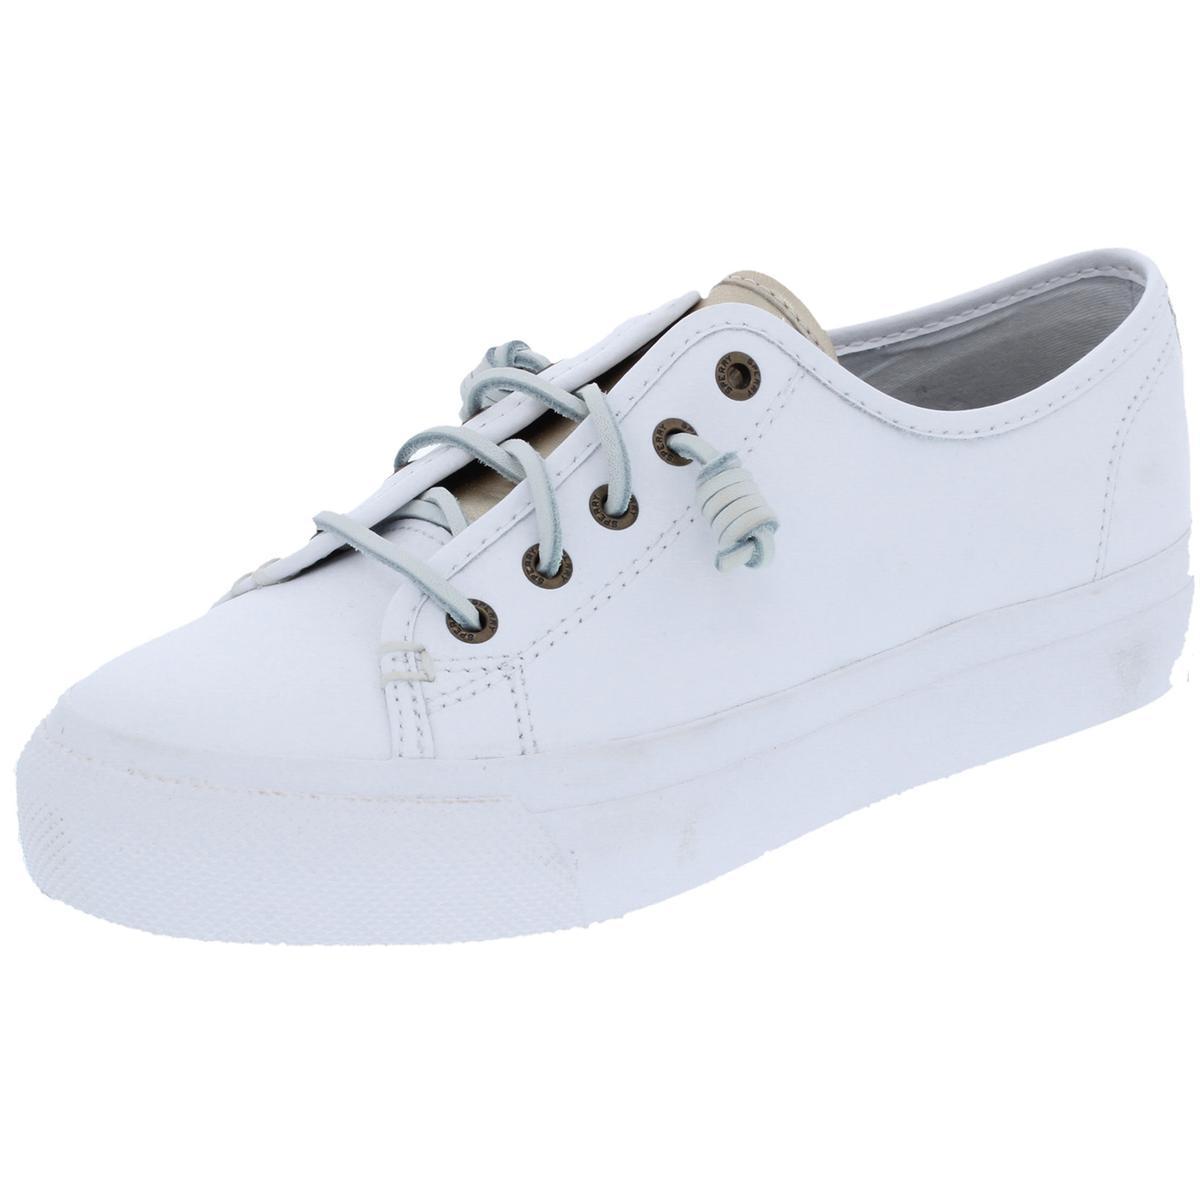 Sperry Womens Sky Sail White Fashion Sneakers Shoes 10 Medium (BM) BHFO 0157